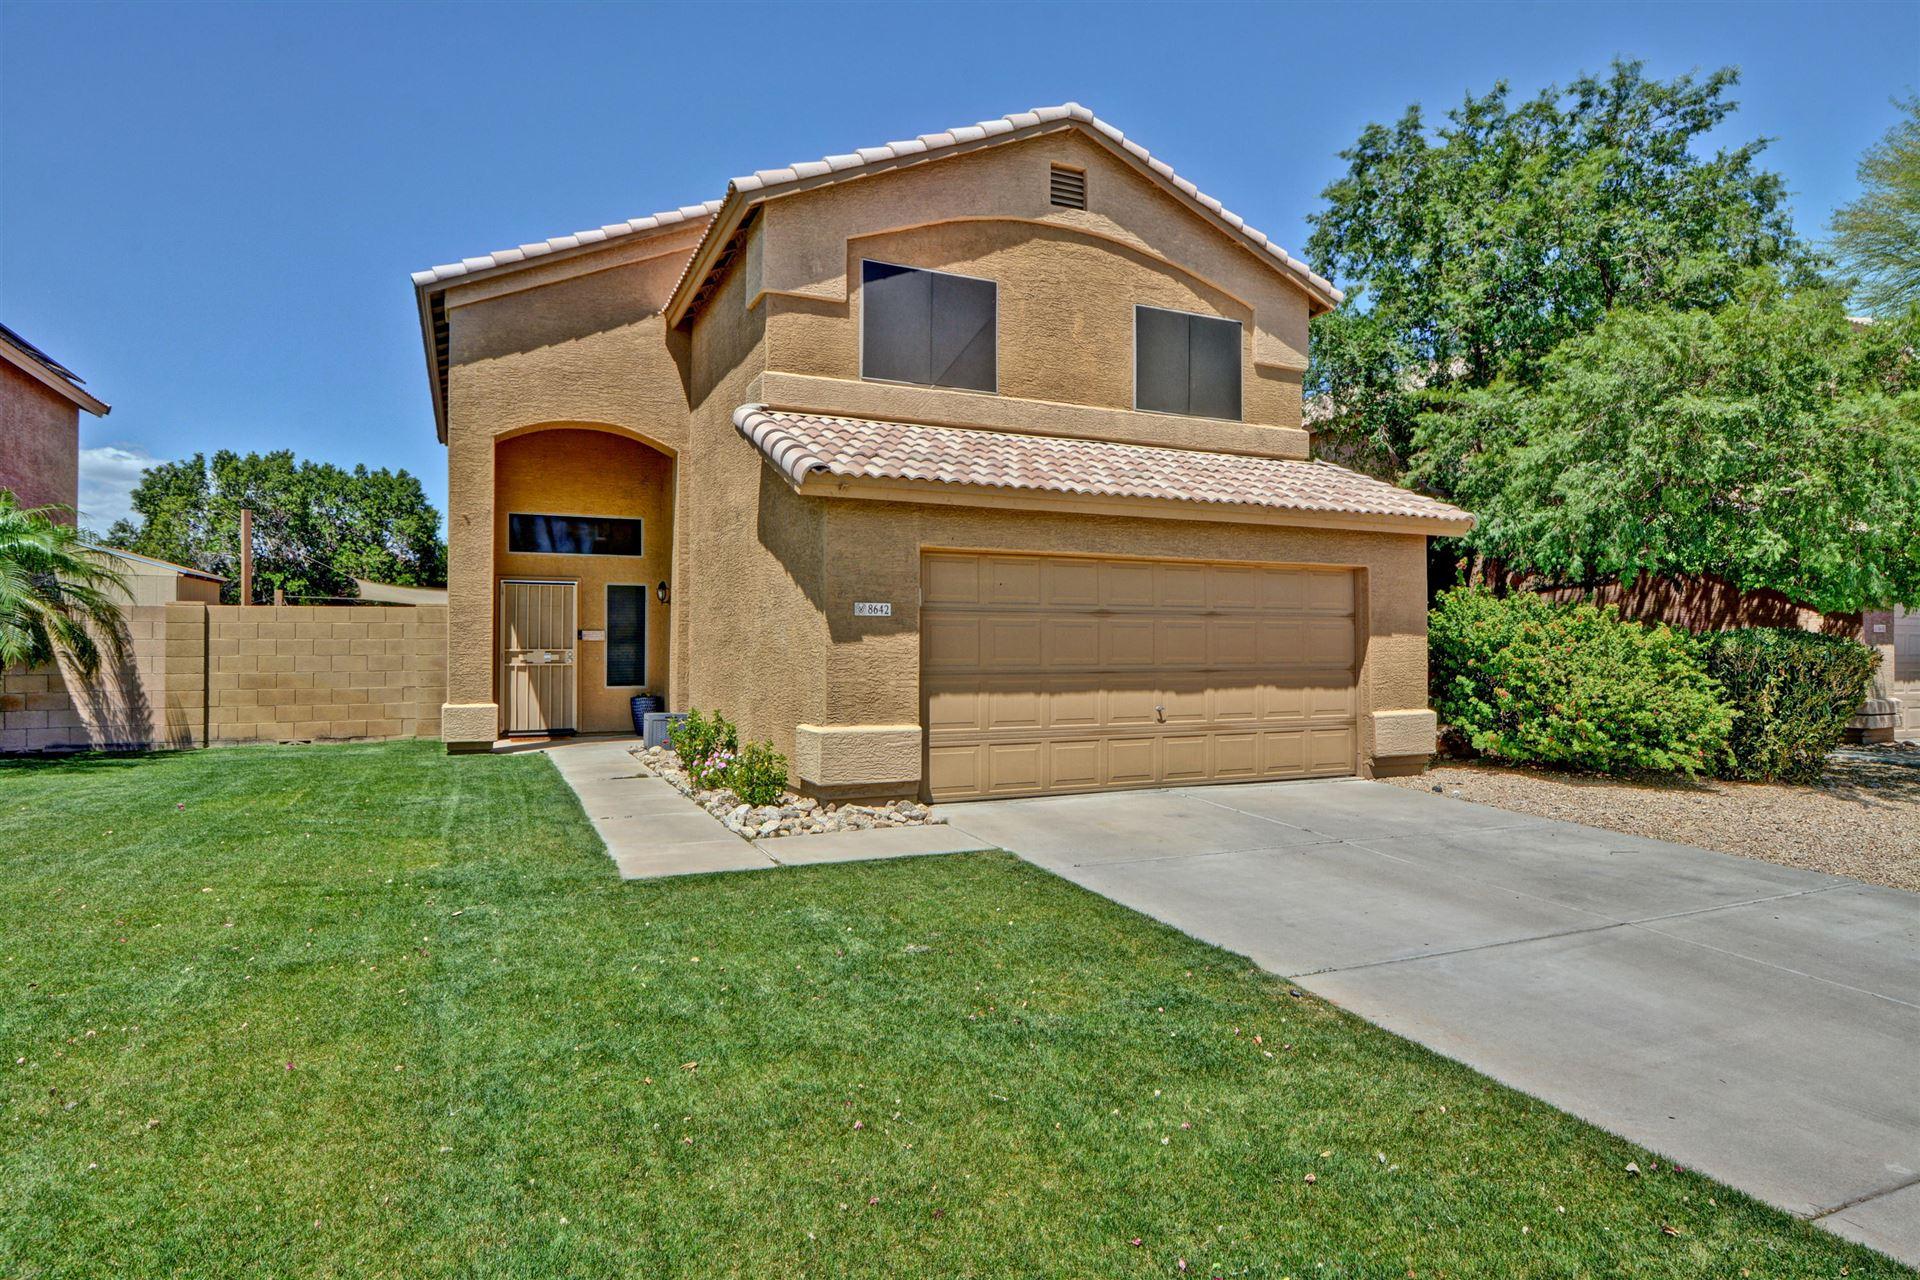 Photo of 8642 W FARGO Drive, Peoria, AZ 85382 (MLS # 6231804)